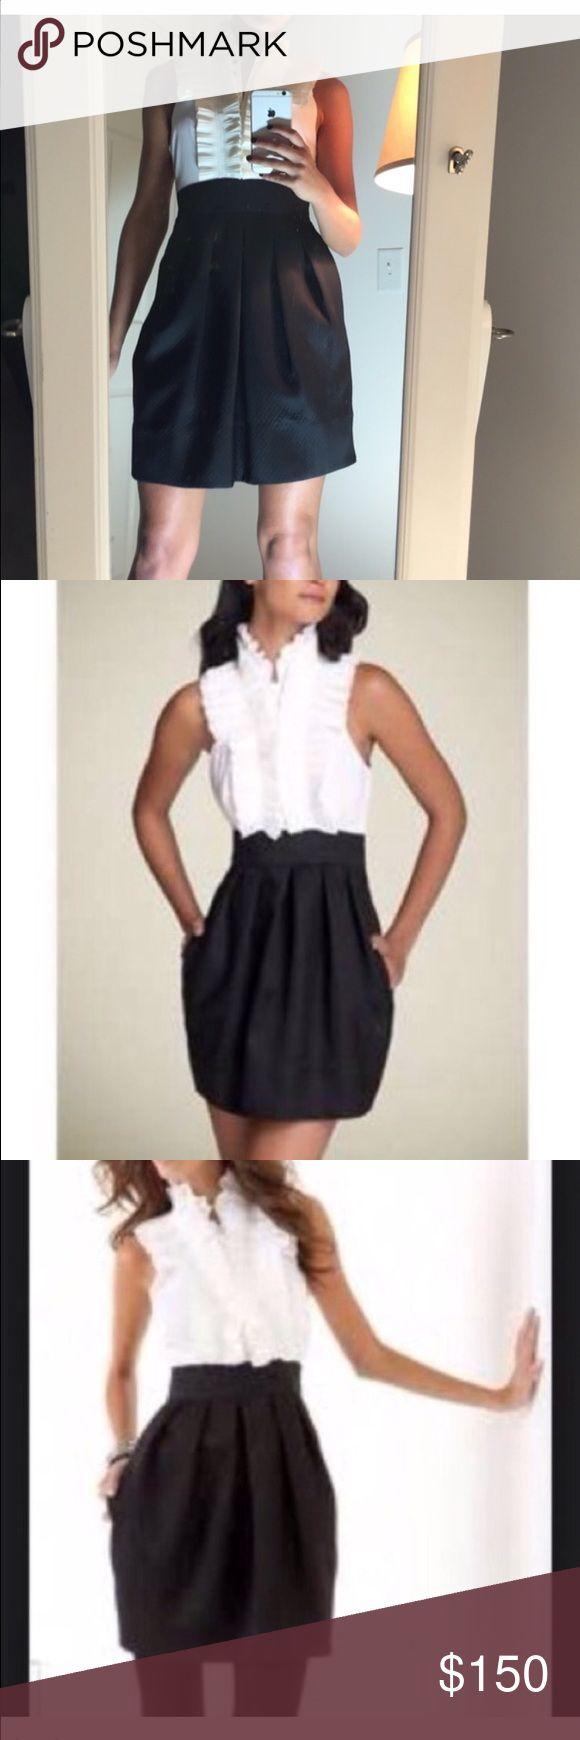 🎉 BCBGMaxAzria Classic Tuxedo Style Dress 🎉 😍 GORGEOUS GORGEOUS GORGEOUS Dress! Definitely a sexy show stopper! Has never been worn! Size 4 ❣ BCBGMaxAzria Dresses